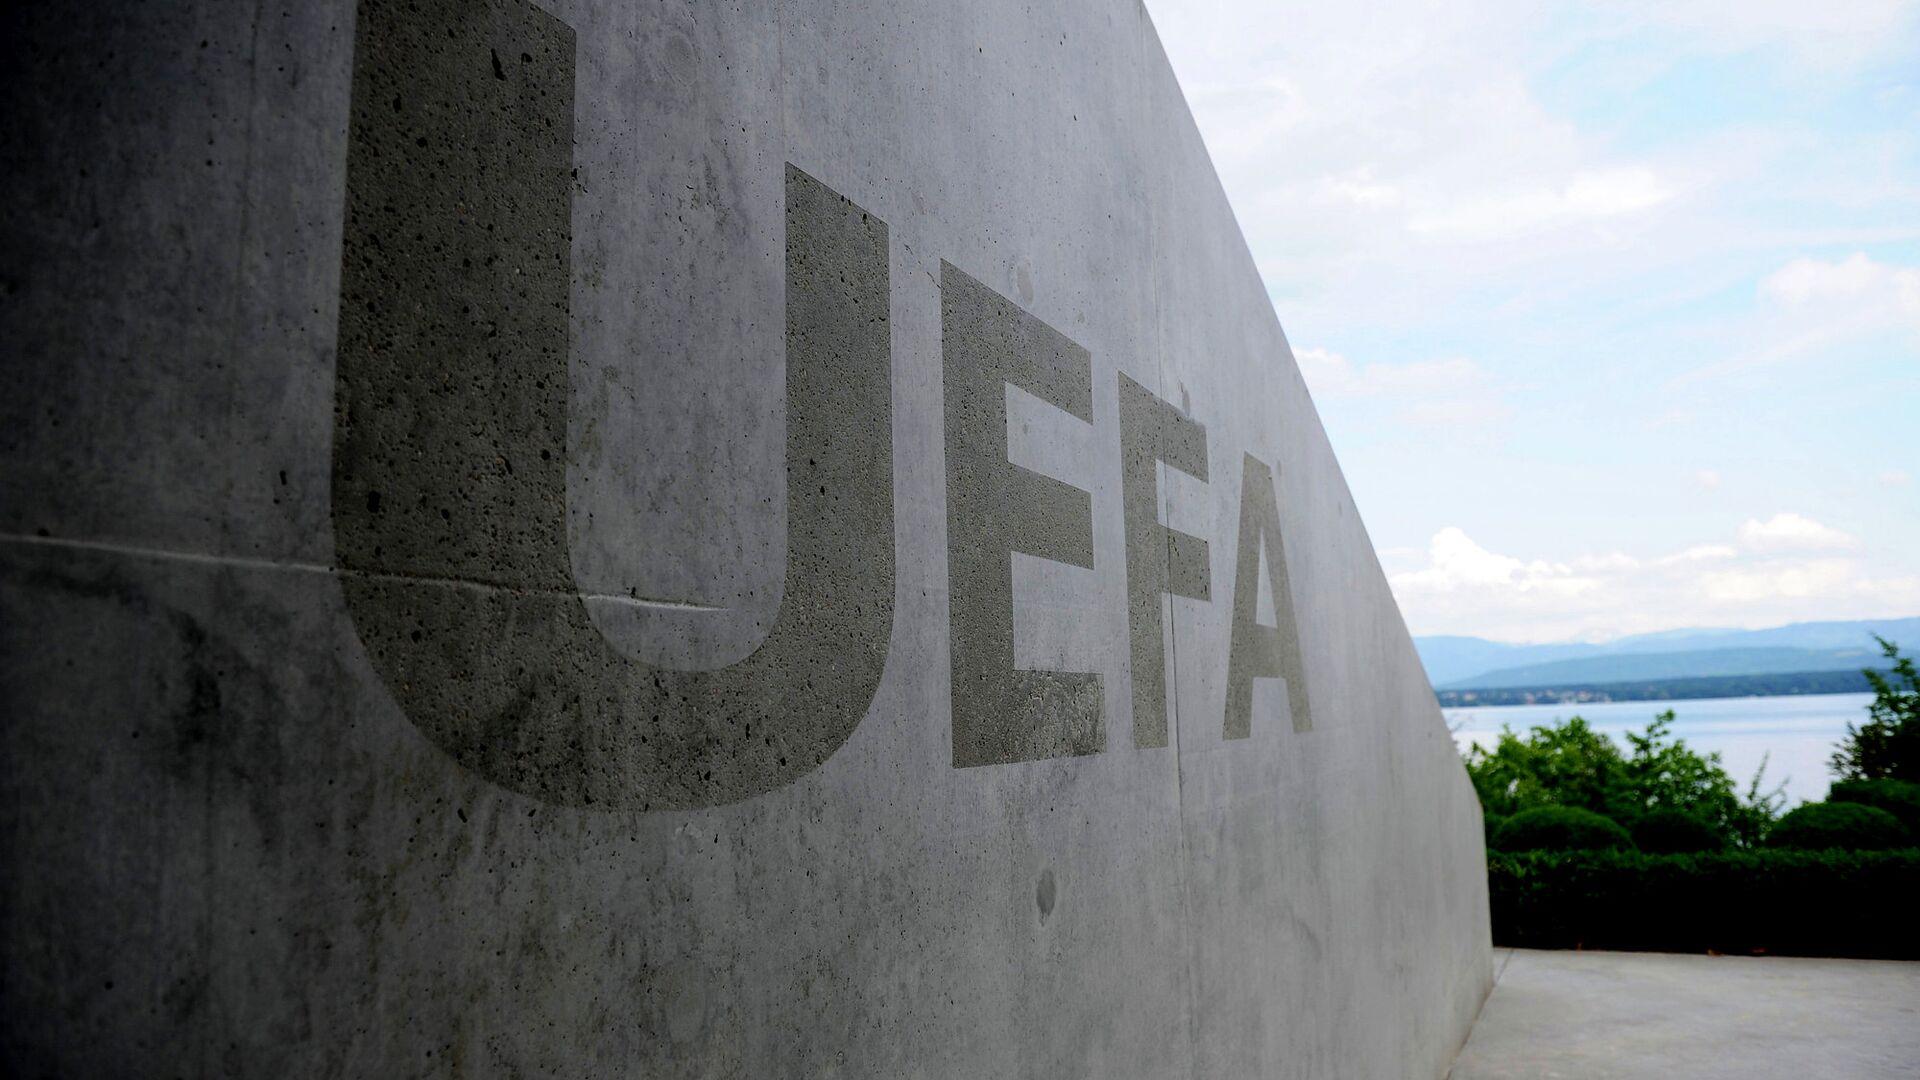 Штаб-квартира УЕФА - РИА Новости, 1920, 24.03.2021